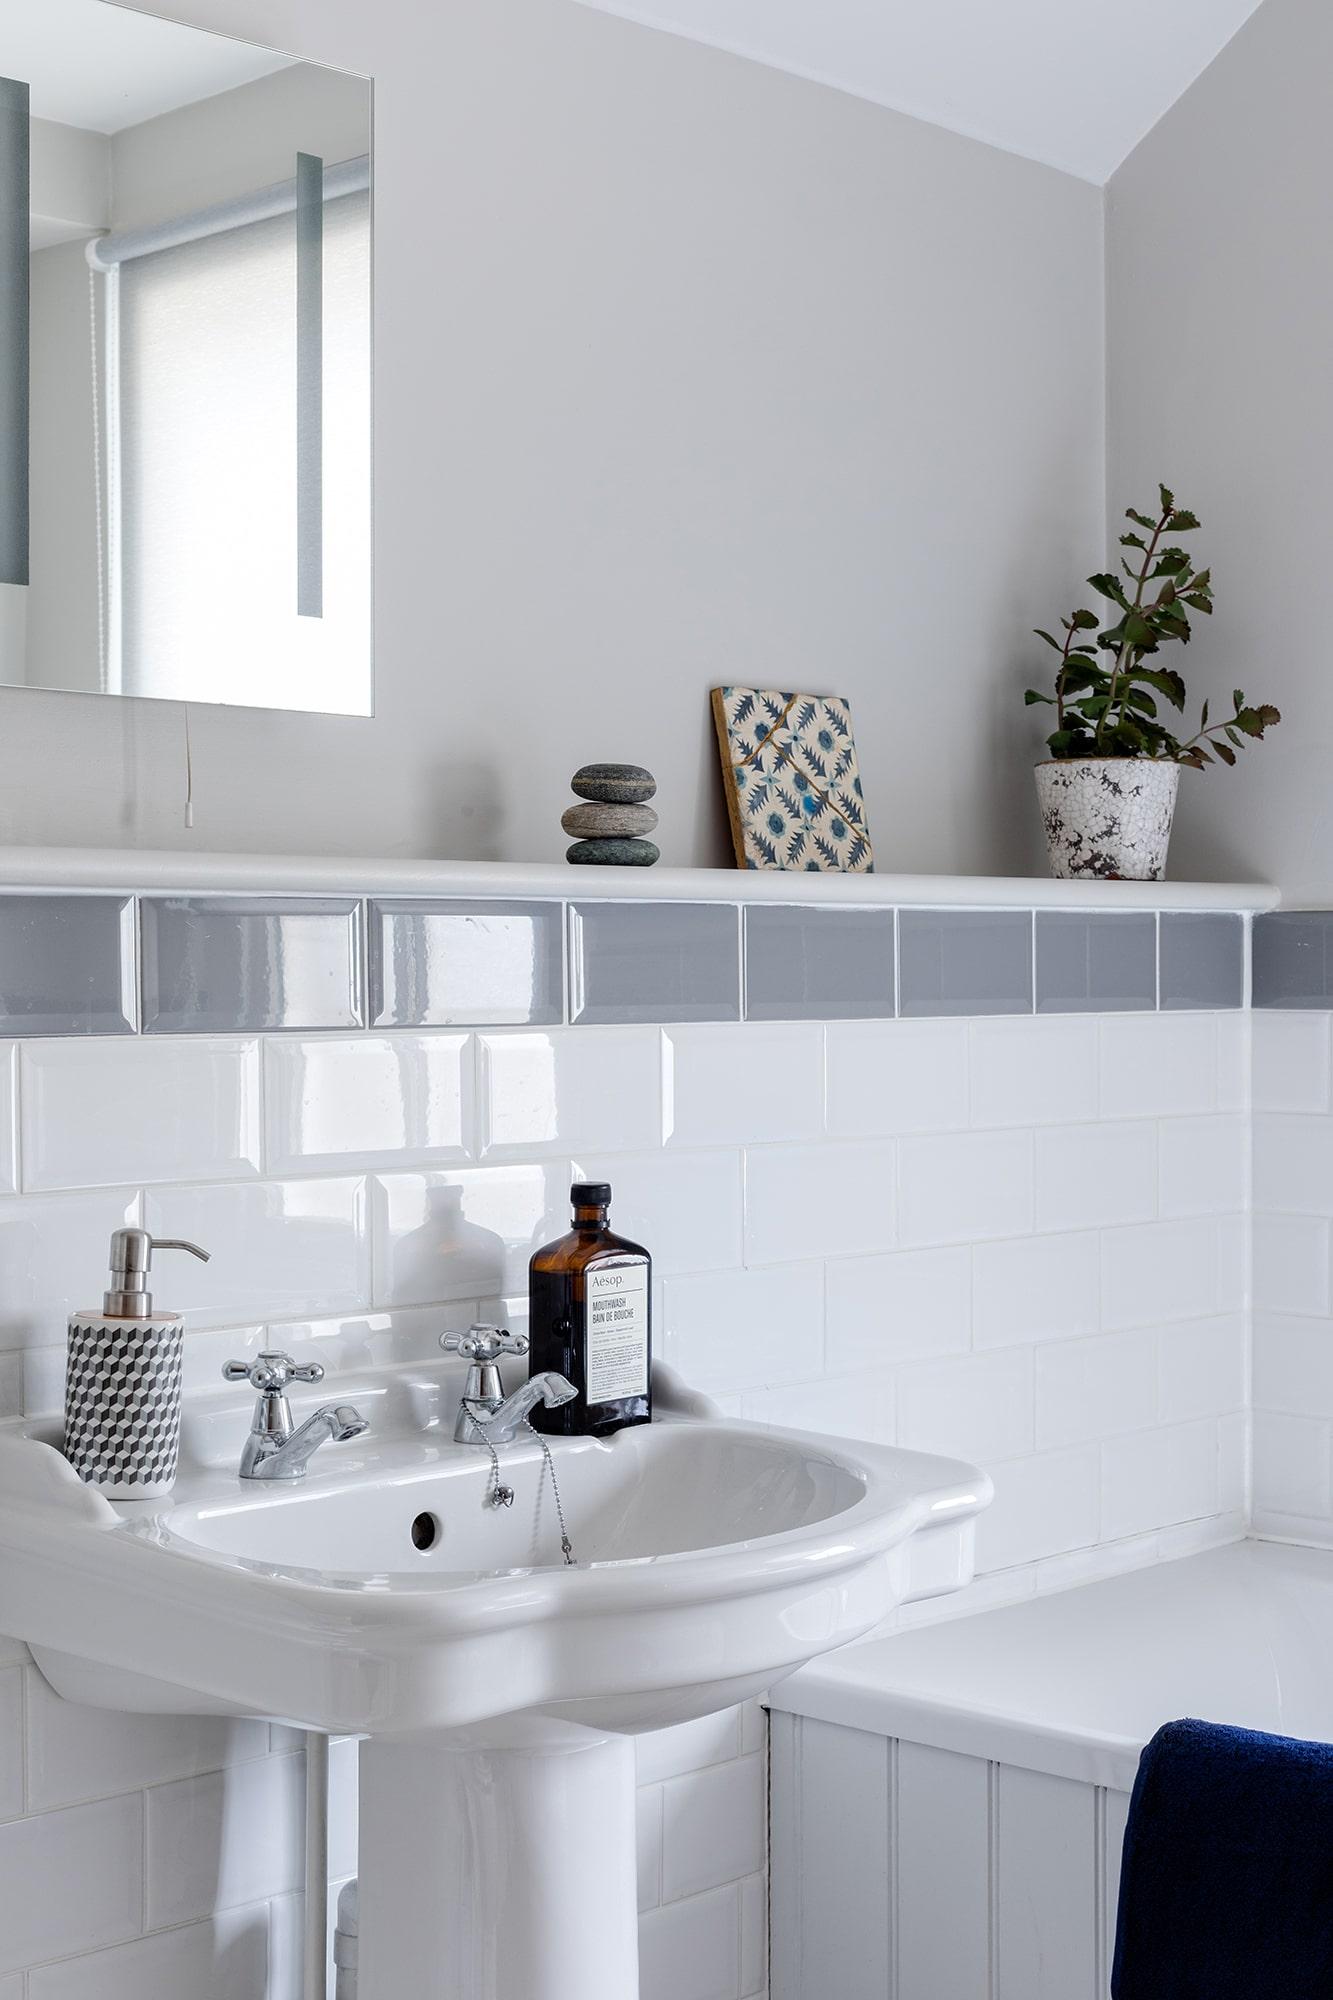 bathroom design detail; sink with accessories